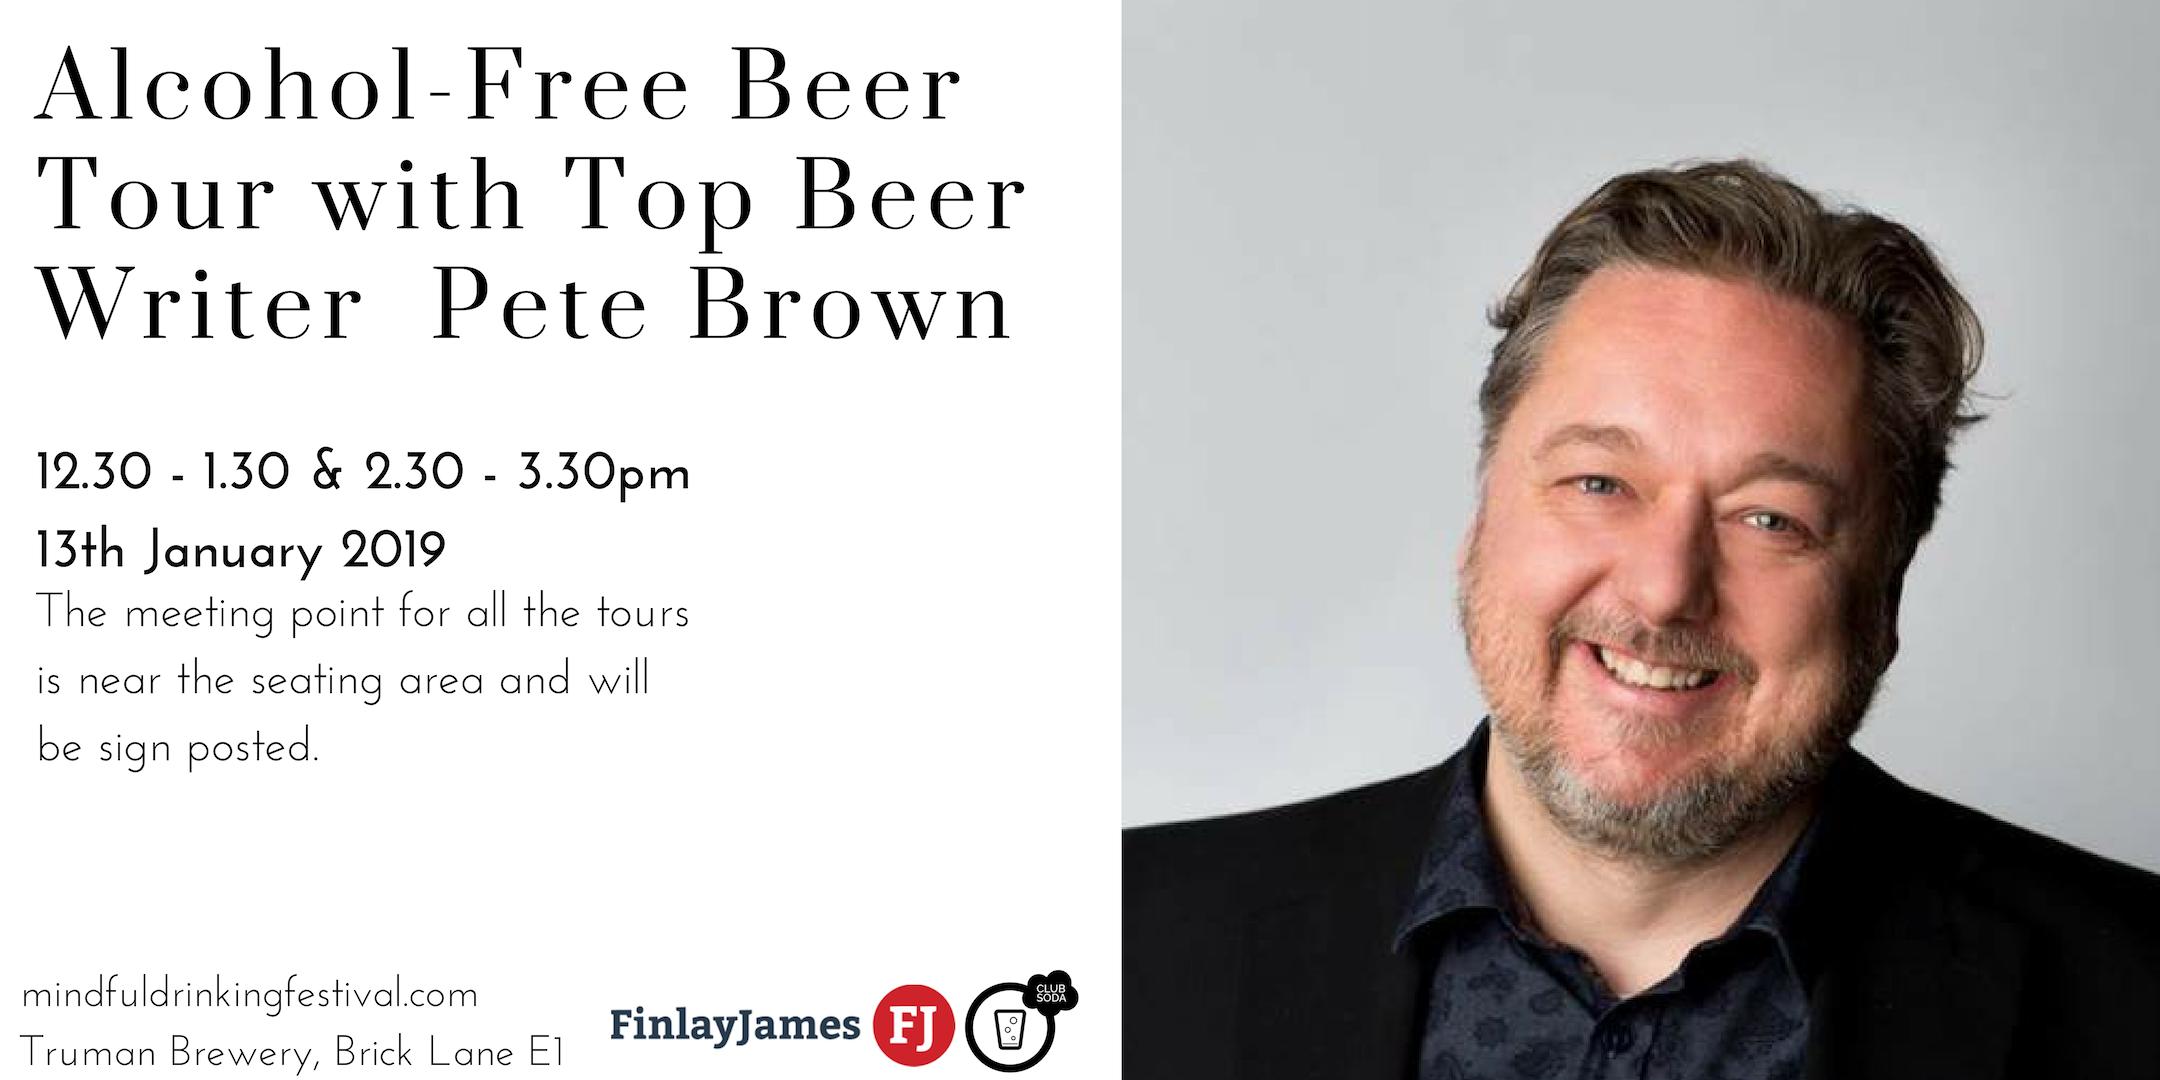 Pete Brown beer tour